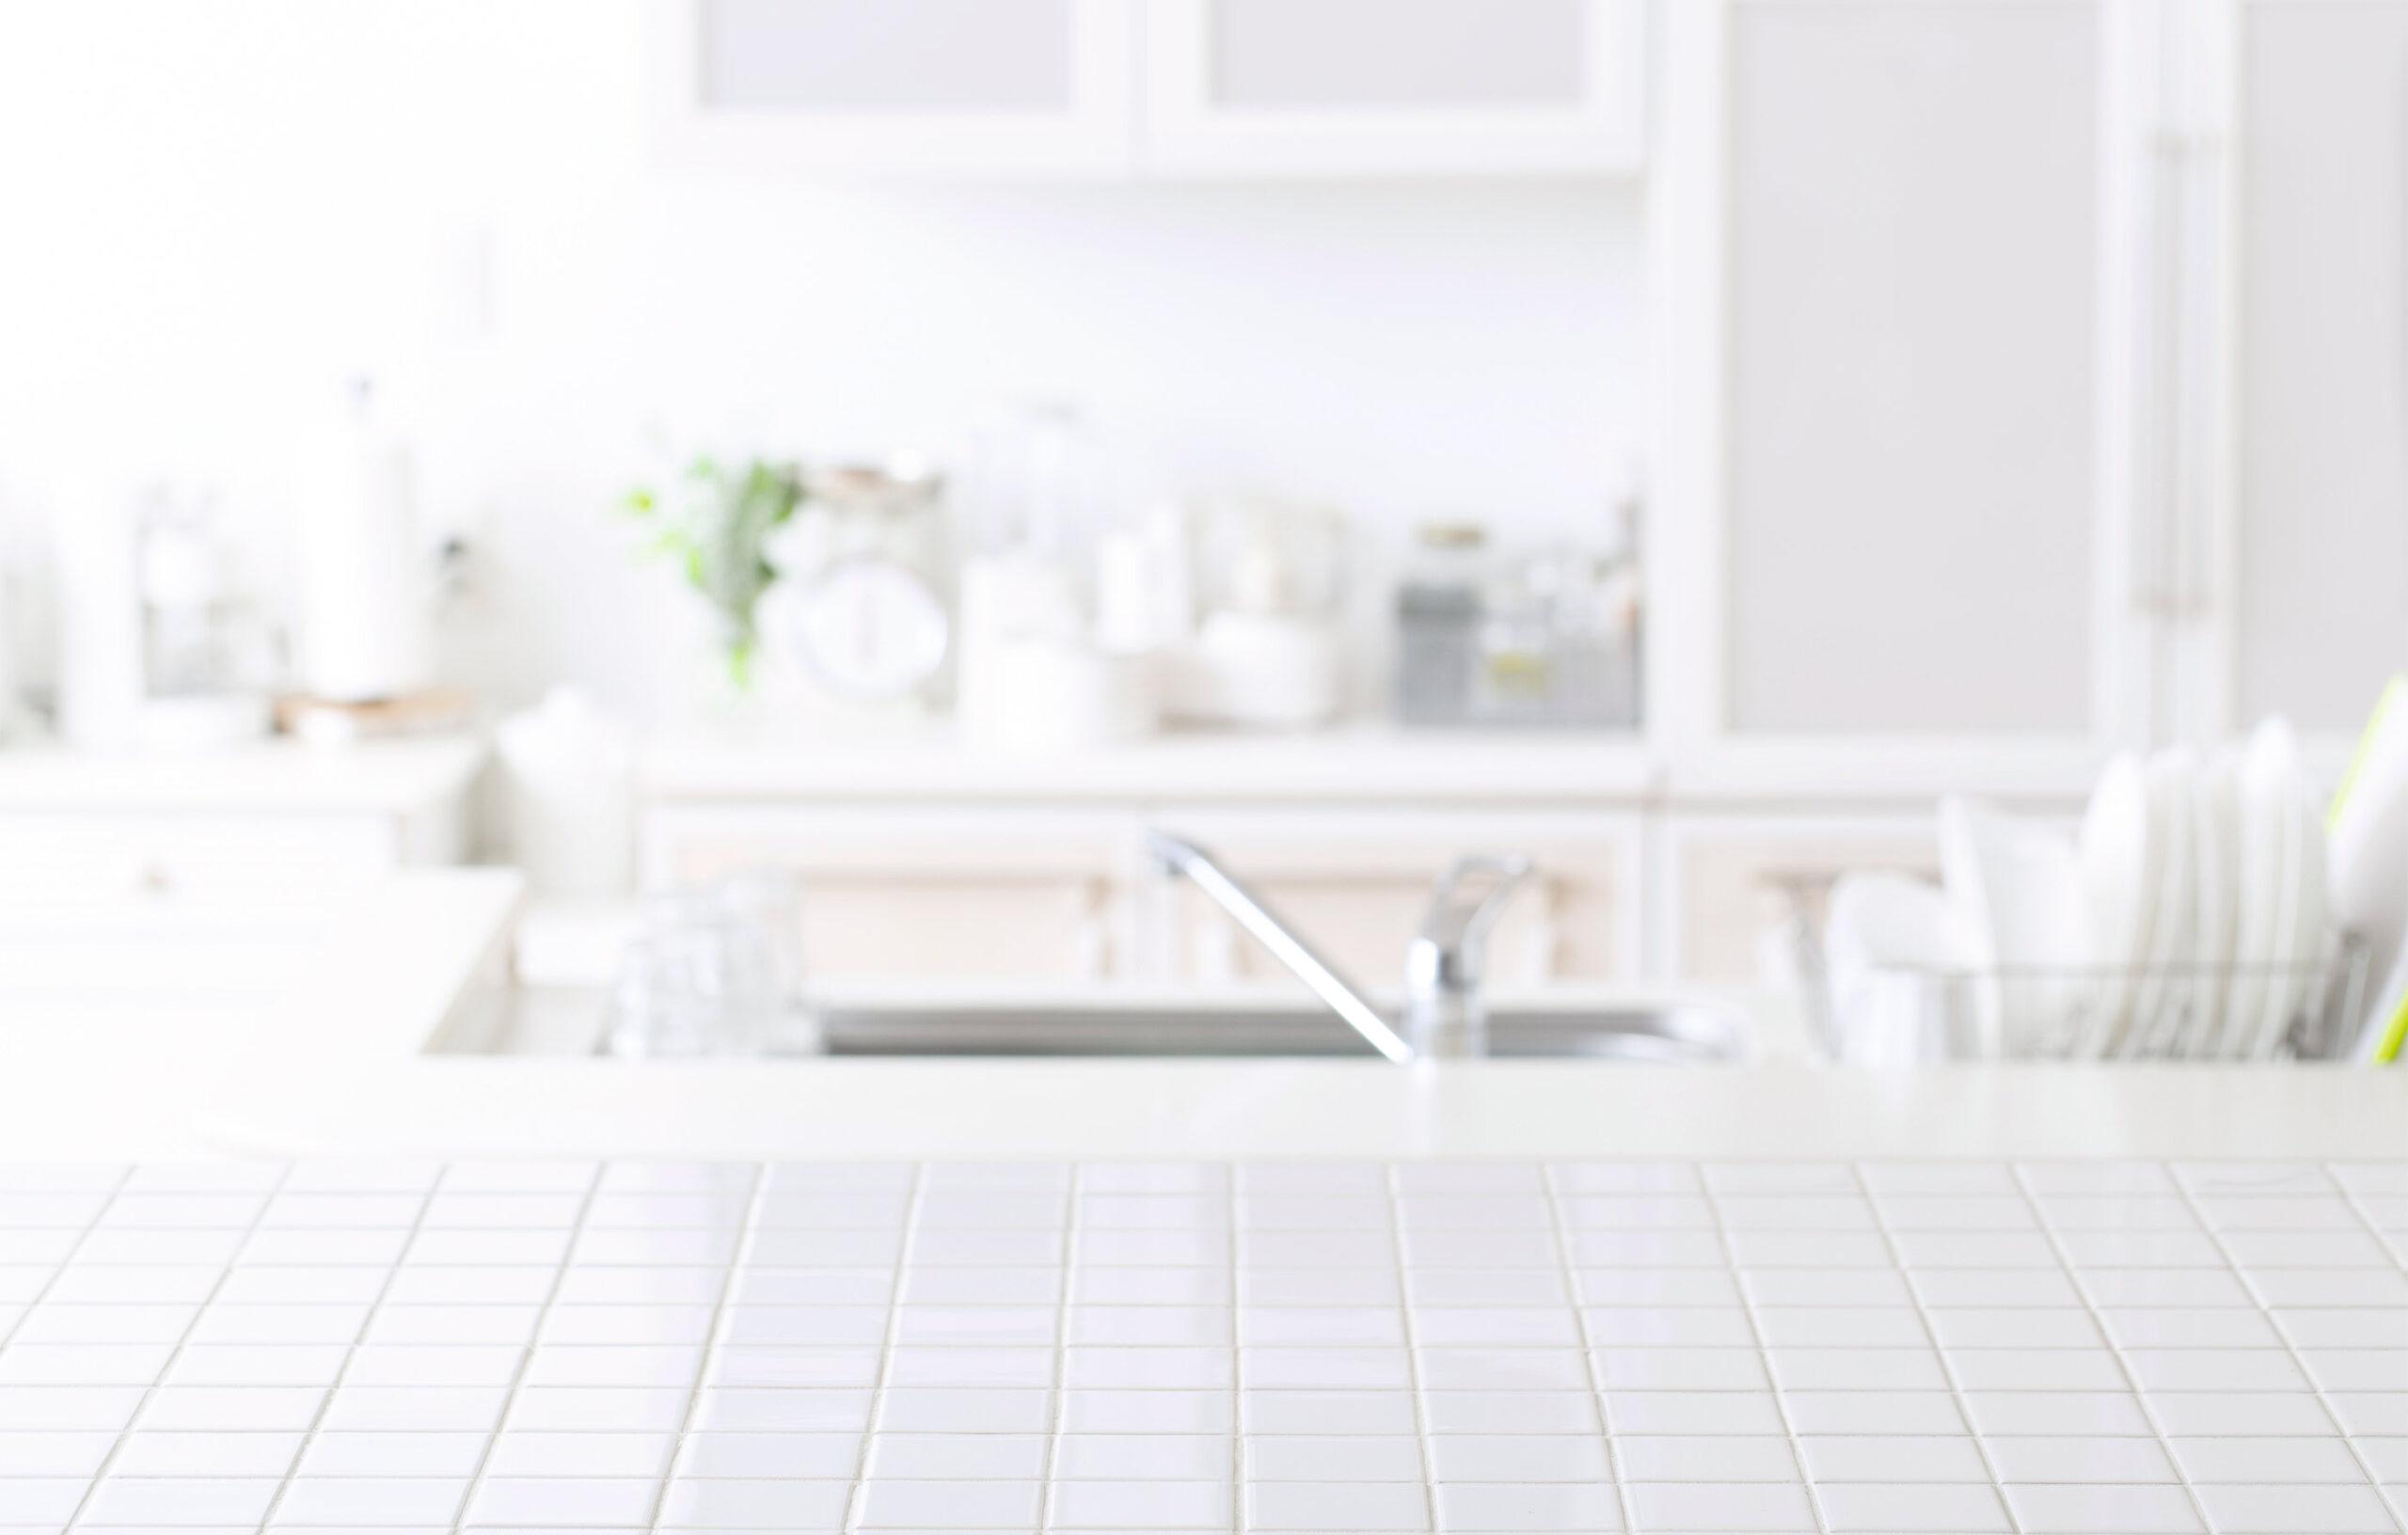 slider-cocina-scaled Rayen | Soluciones innovadoras para el hogar | Cocina | Rayen.com